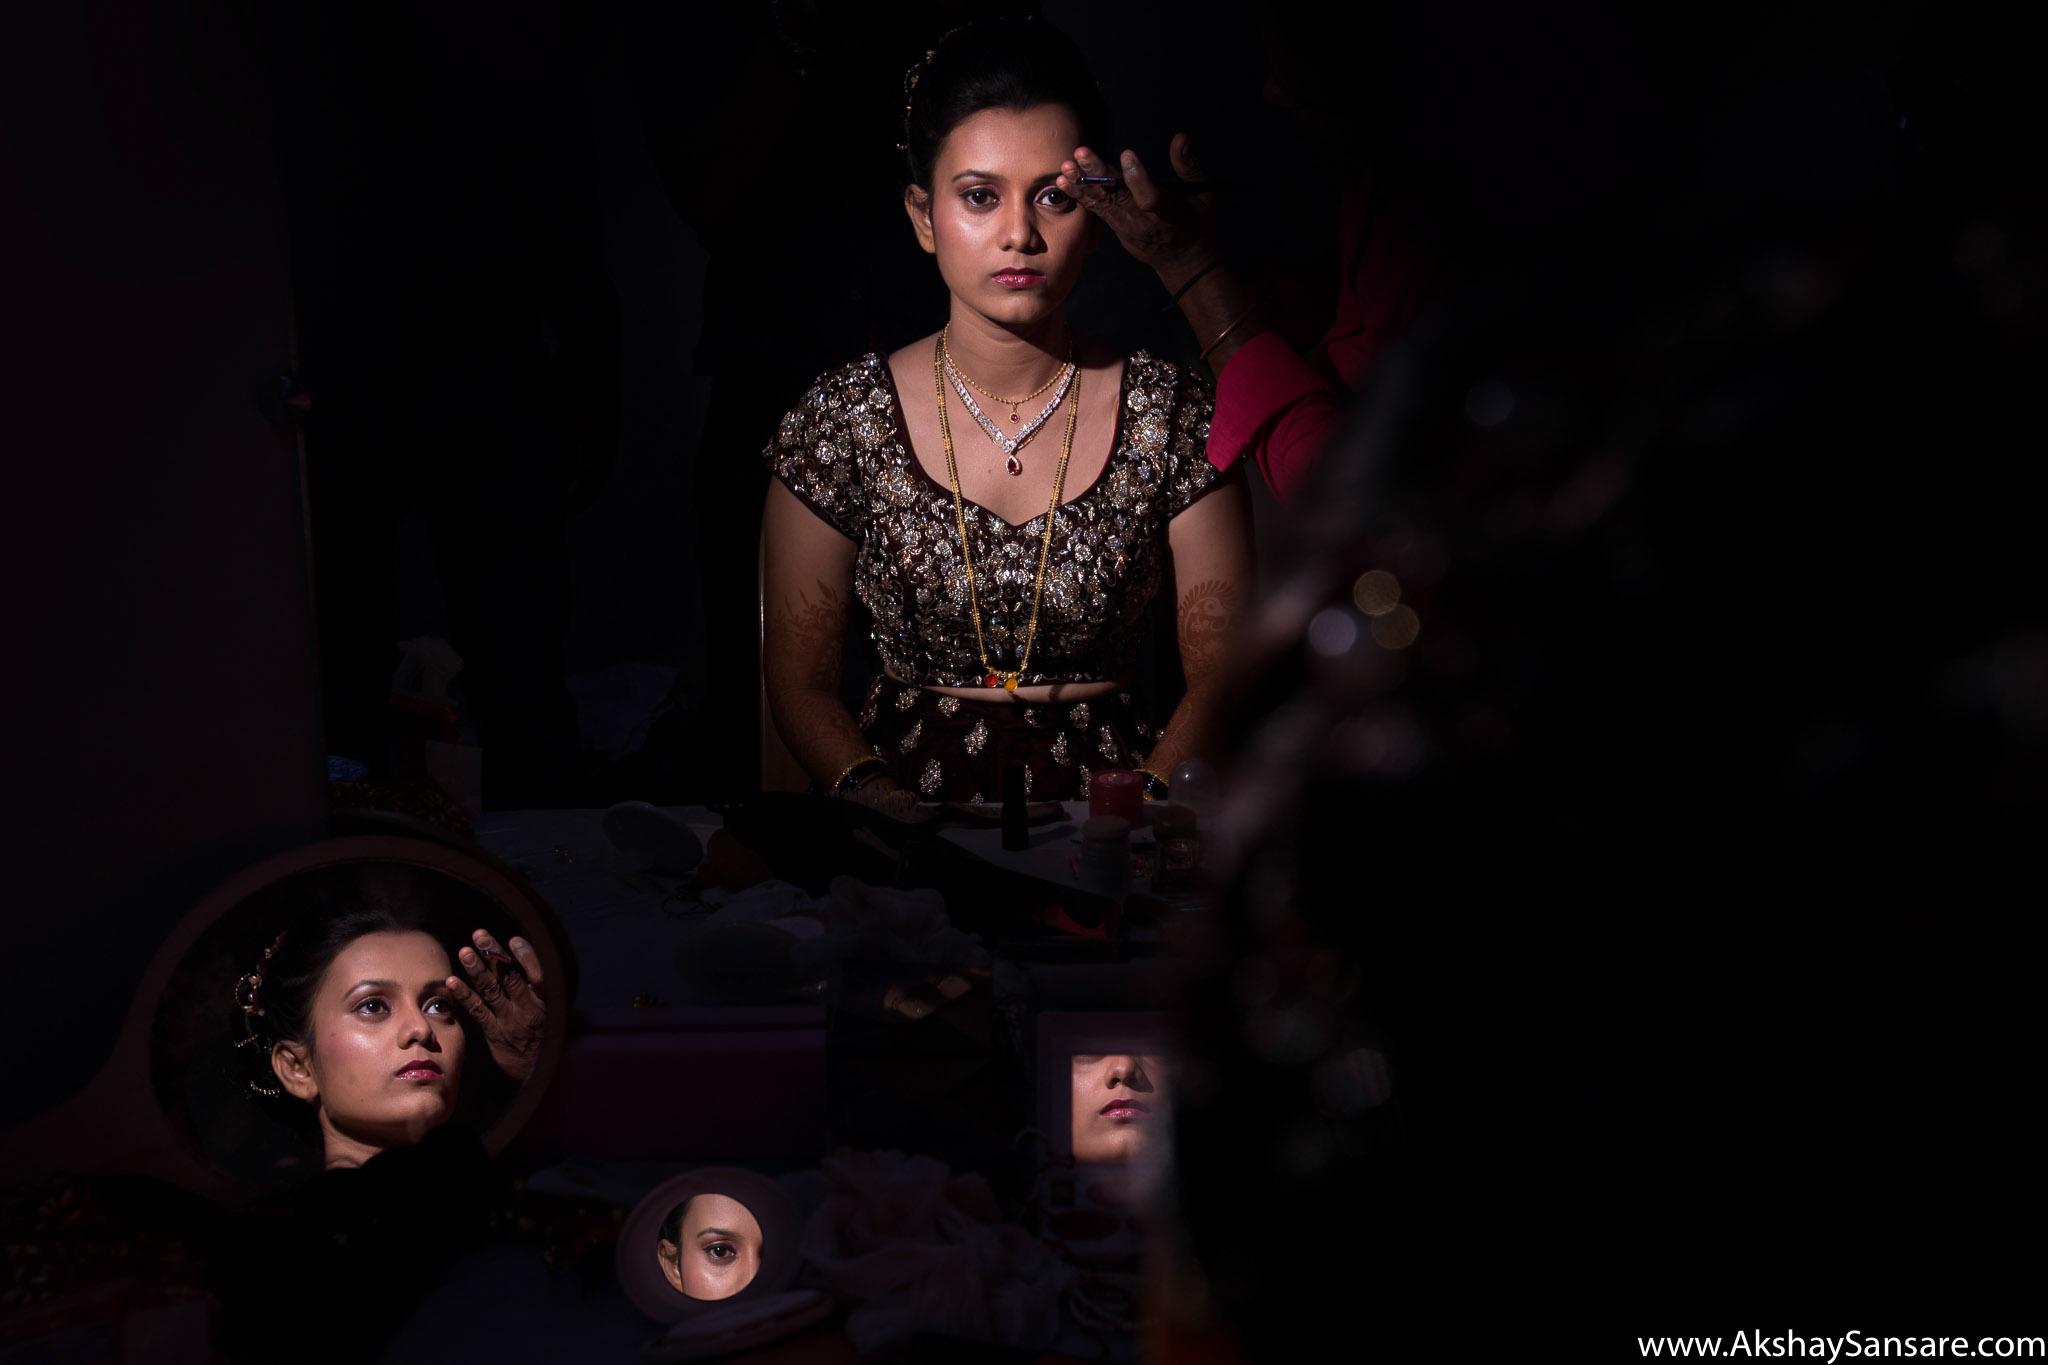 Aditya x Poonam Blog Akshay Sansare Photography Candid Photographer in Mumbai Best Cinematic wedding film filmer-23.jpg